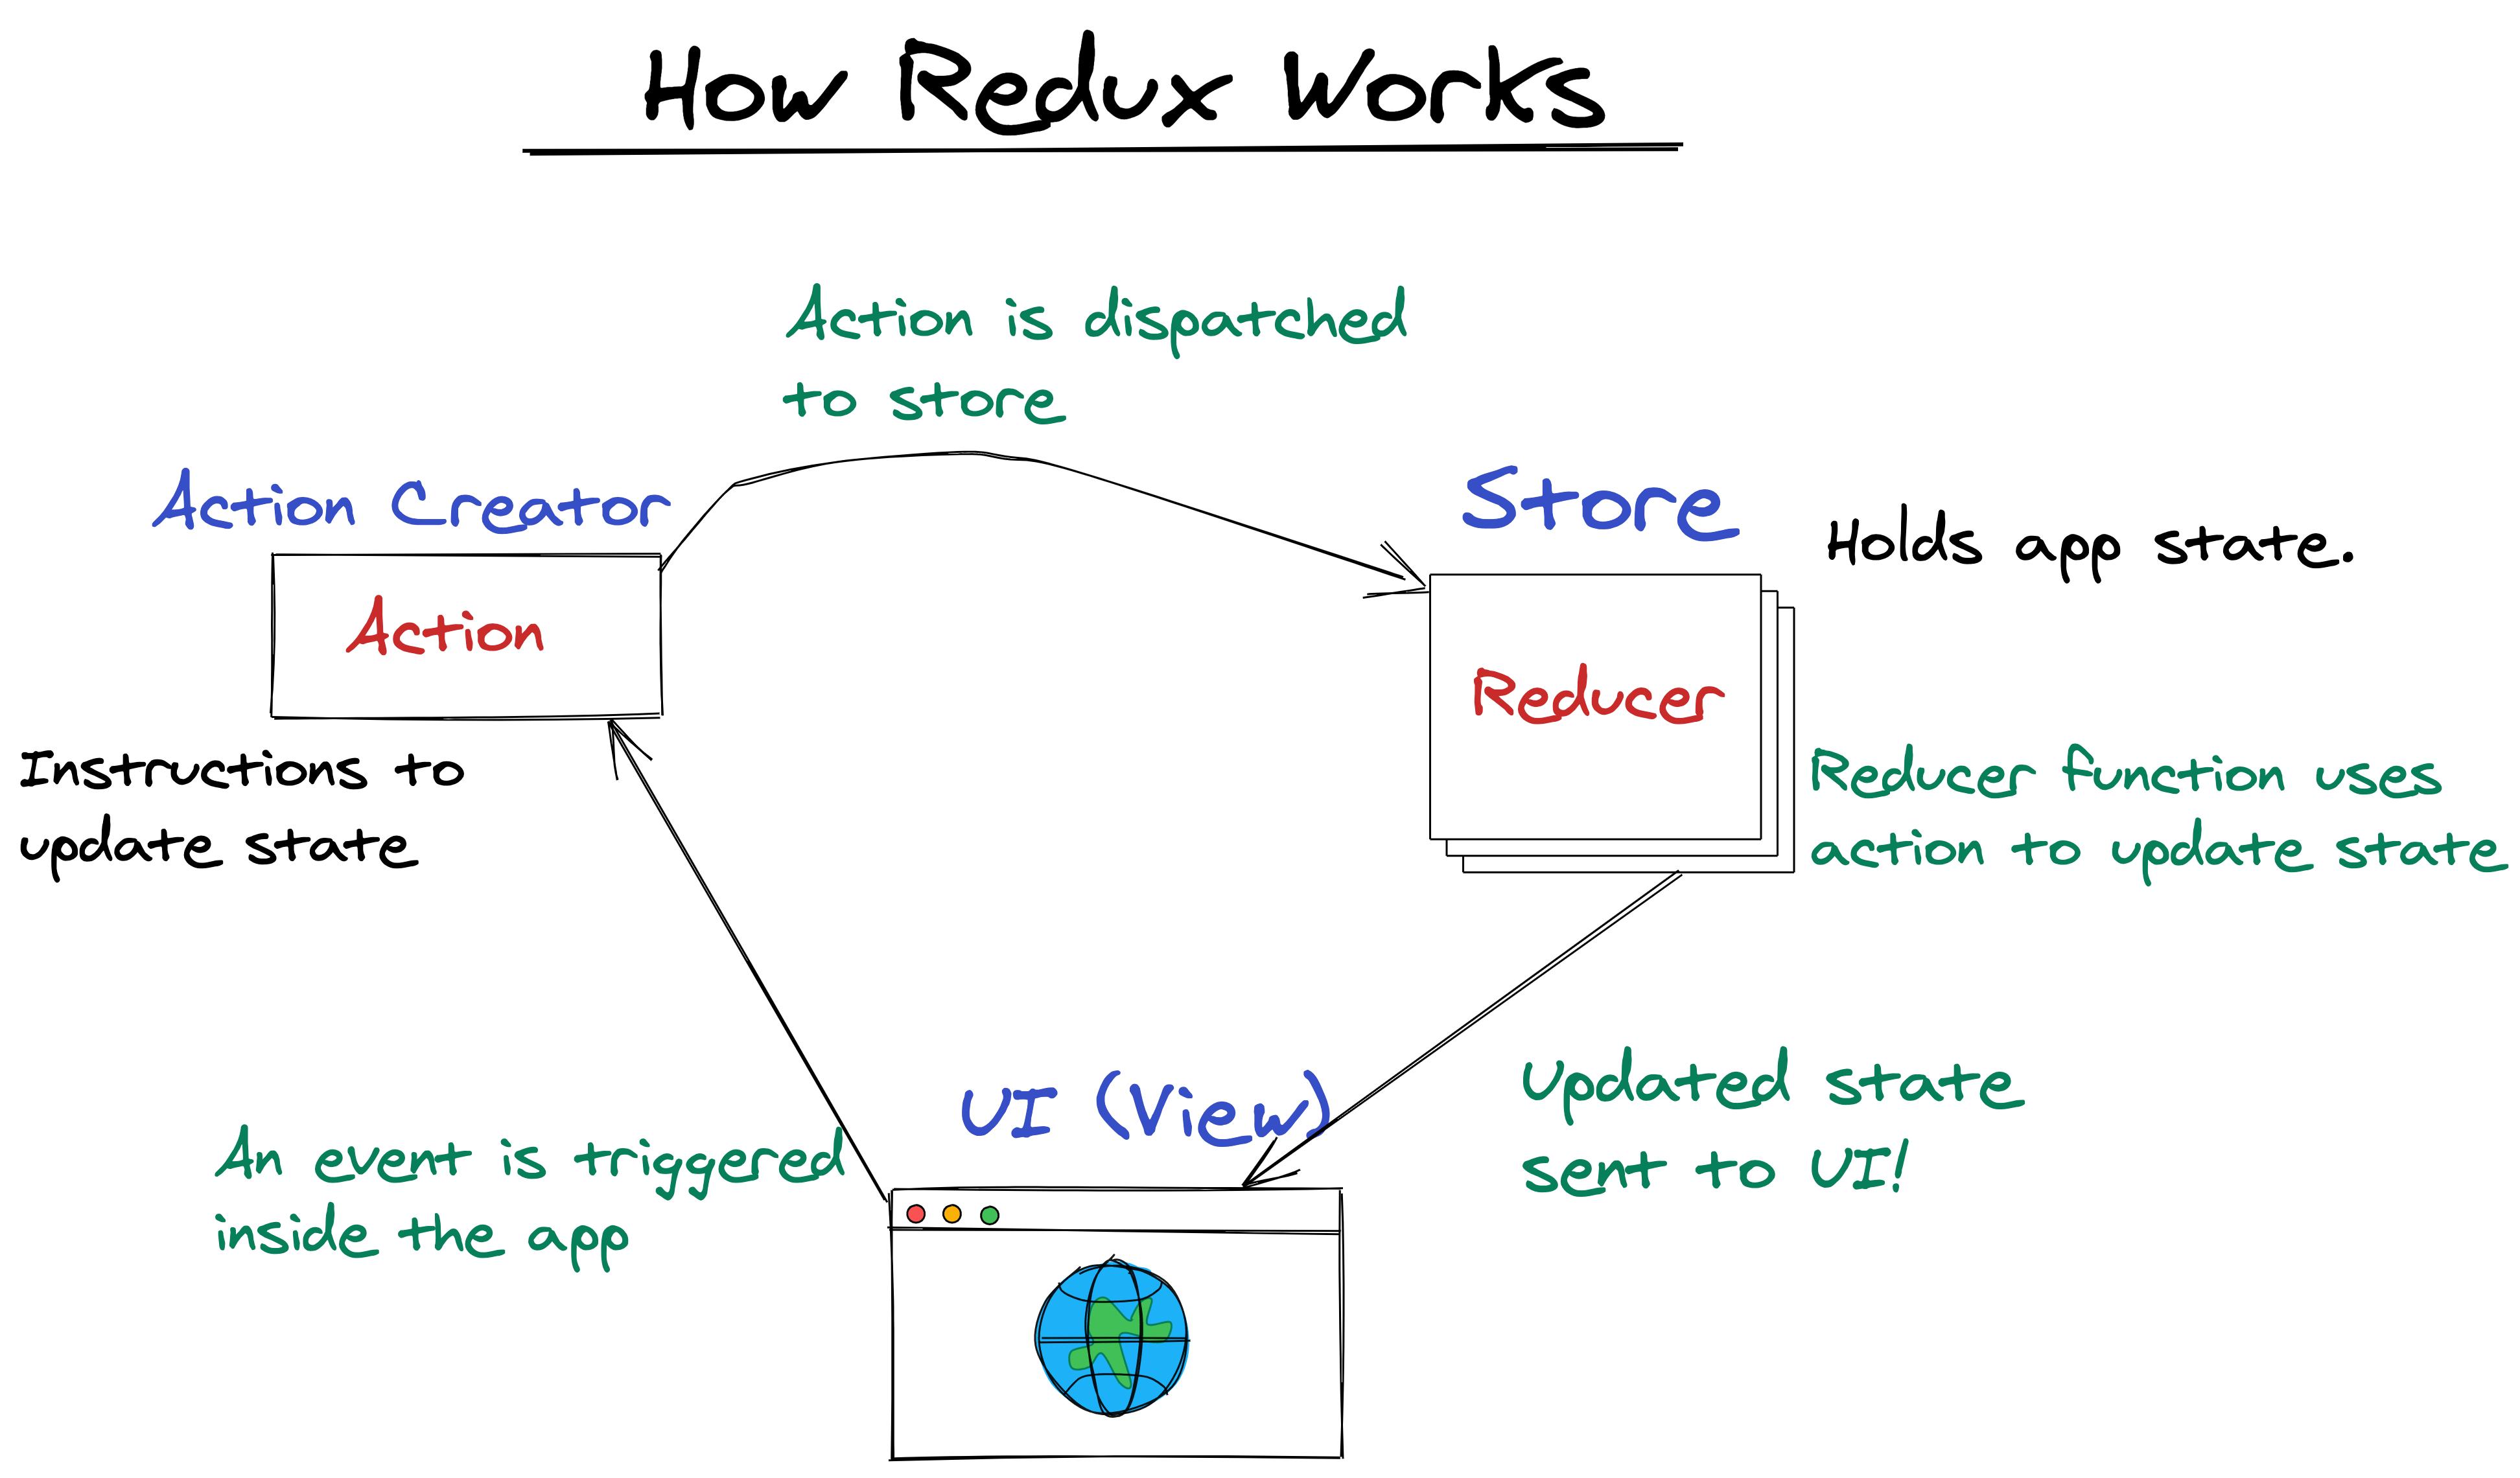 redux-flow-diagram